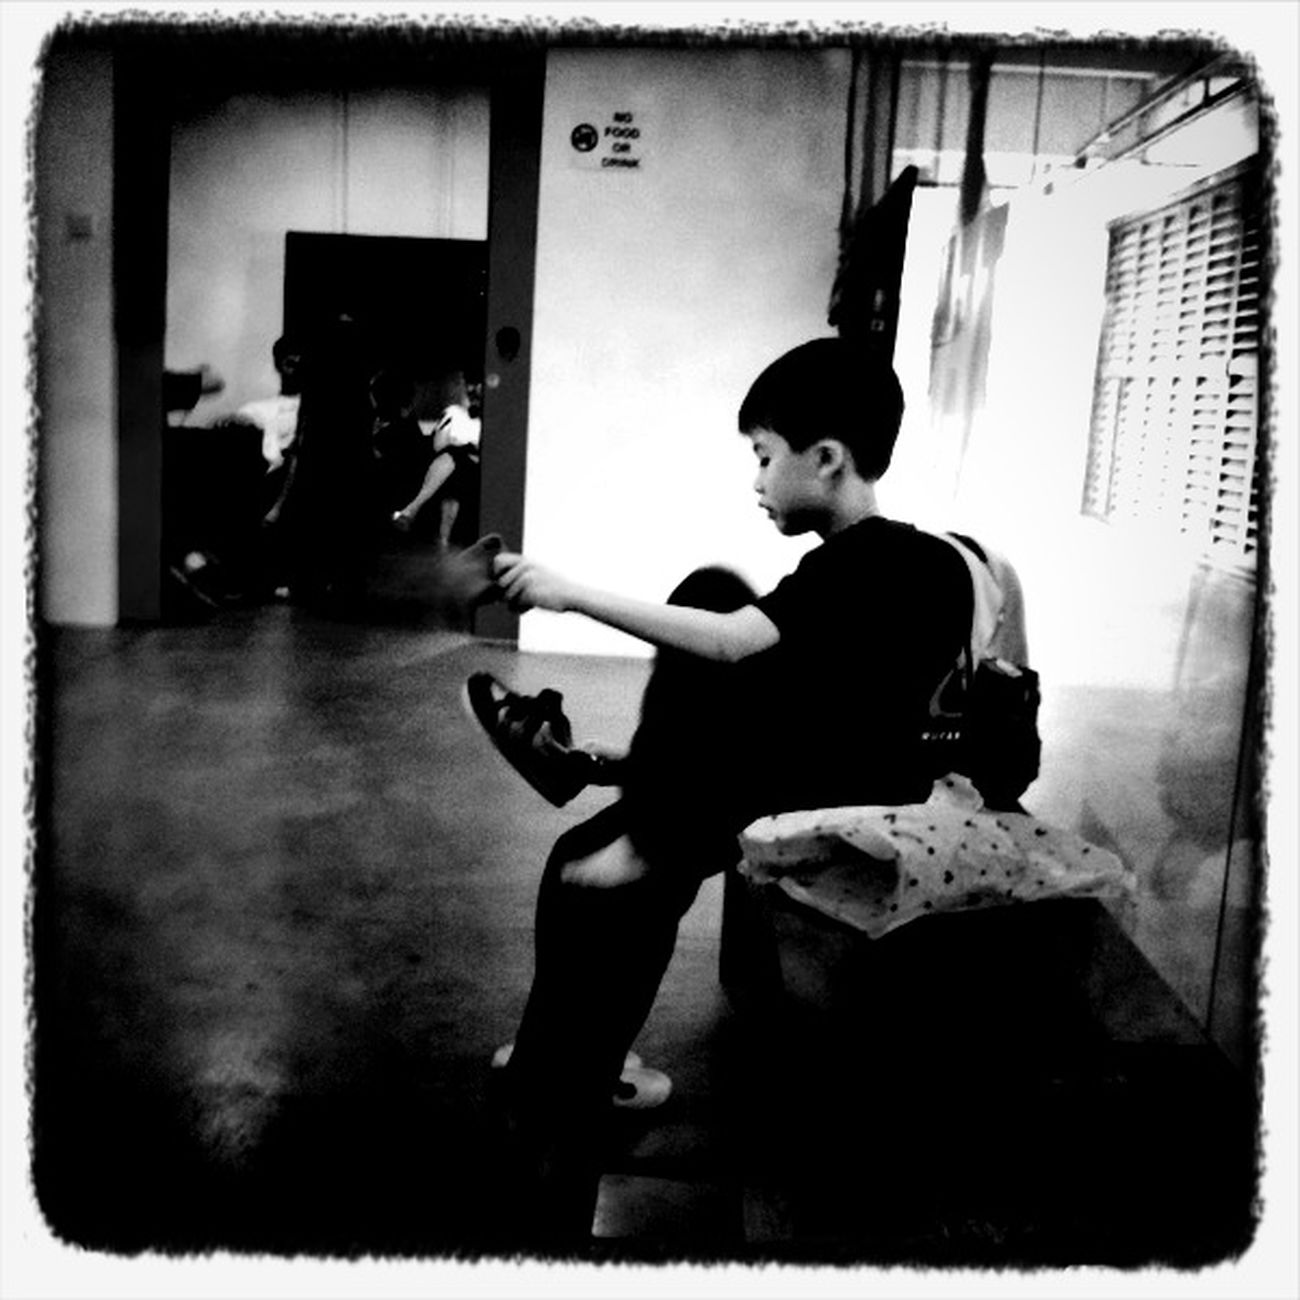 at Longkang @ Jurong East No Flash Claunch 72 Monochrome Film